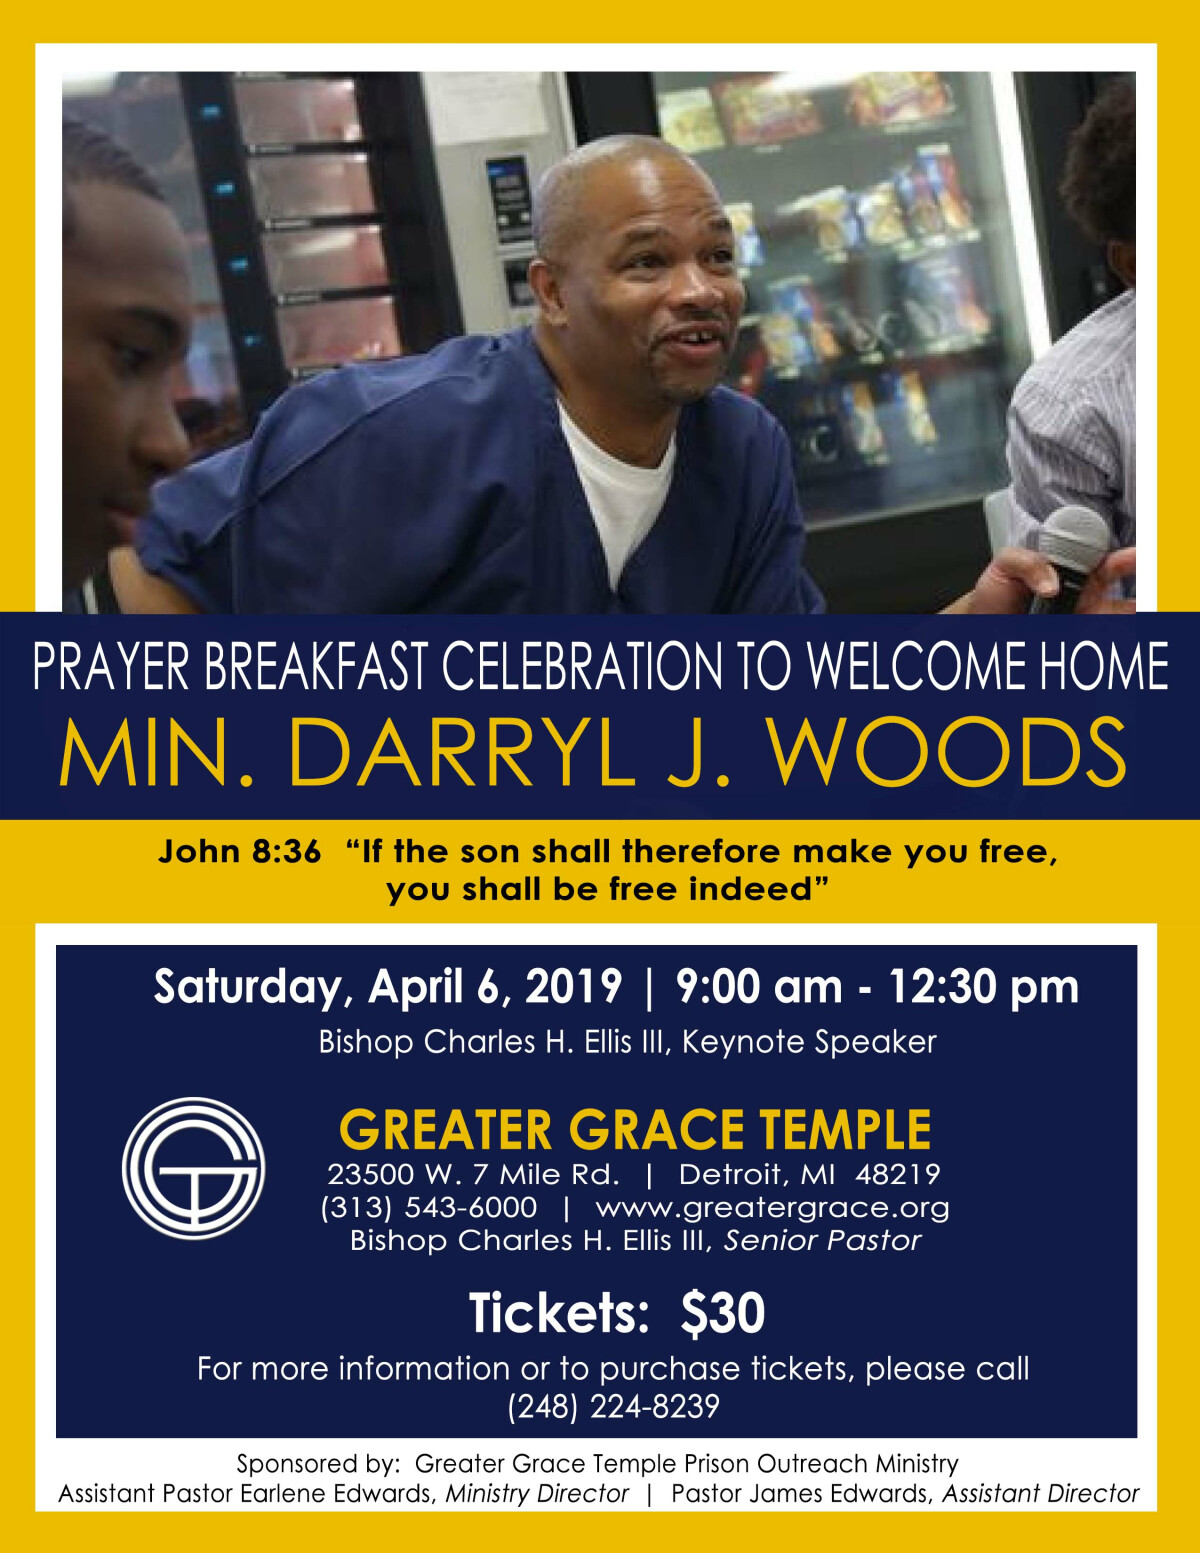 Prayer Breakfast Celebrating Min. Darryl Woods